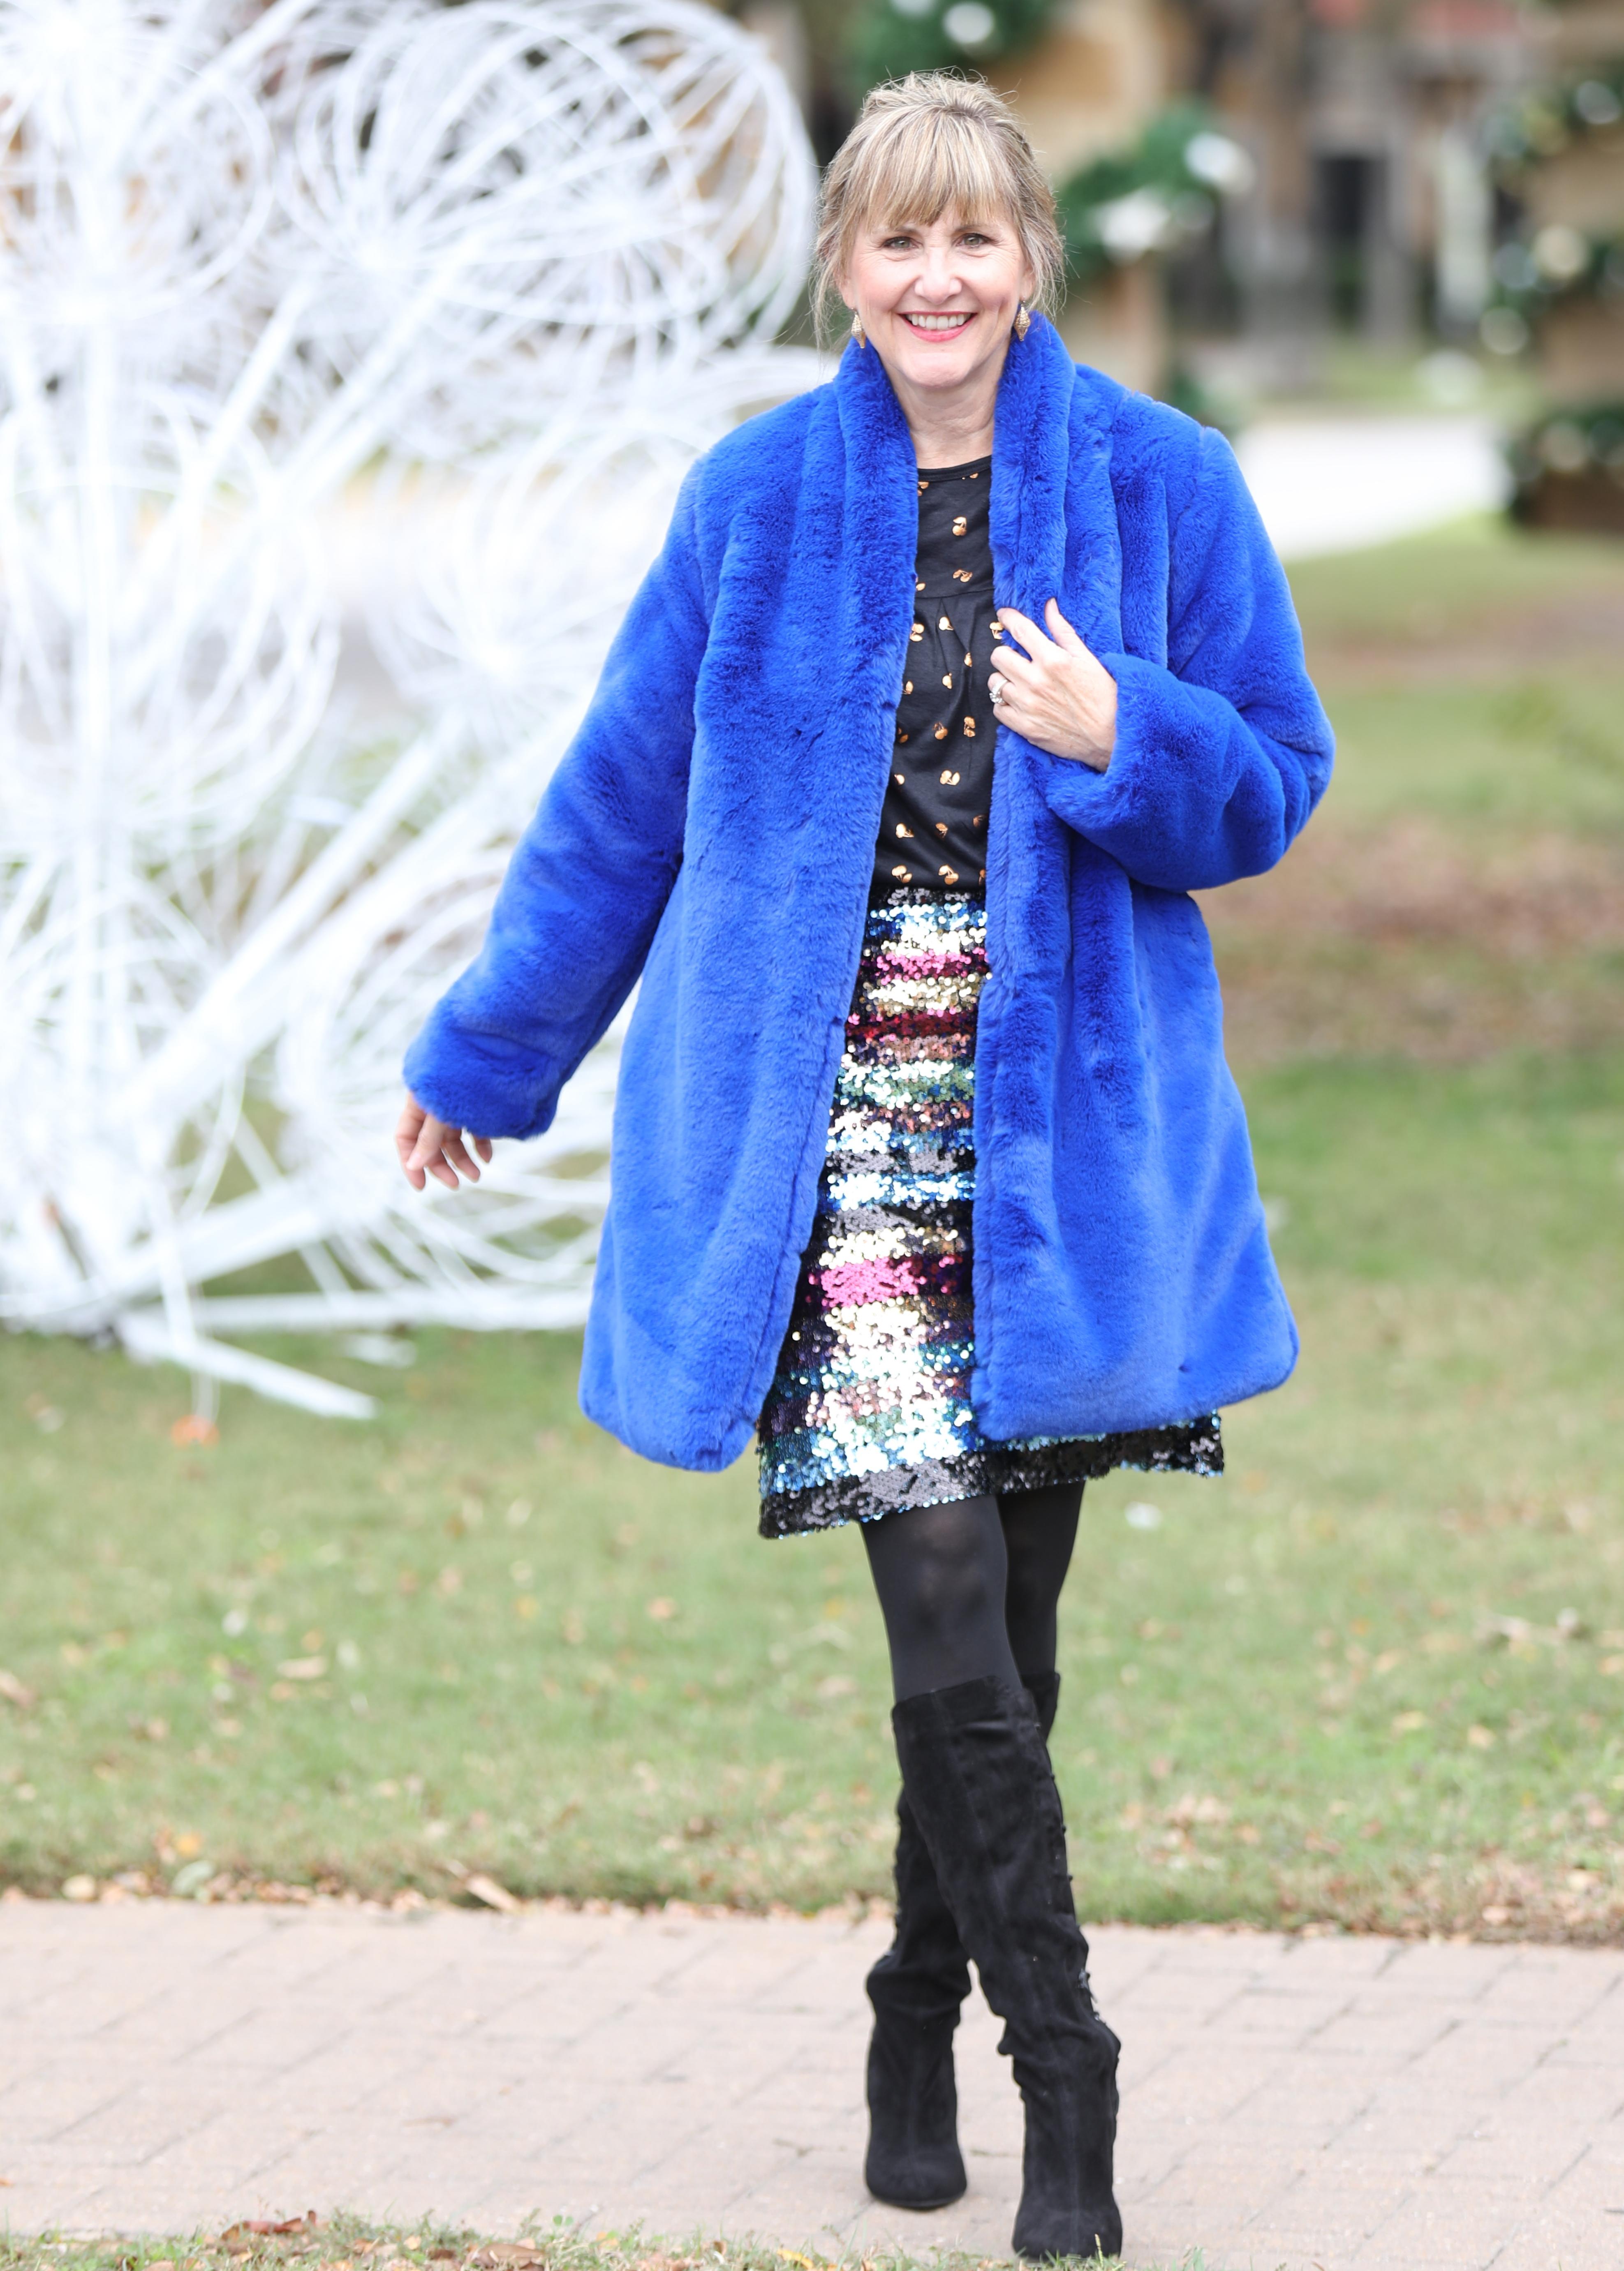 Faux FurJacket, Stein Mart, Cheryl Bemis, Fashionably Cheryl